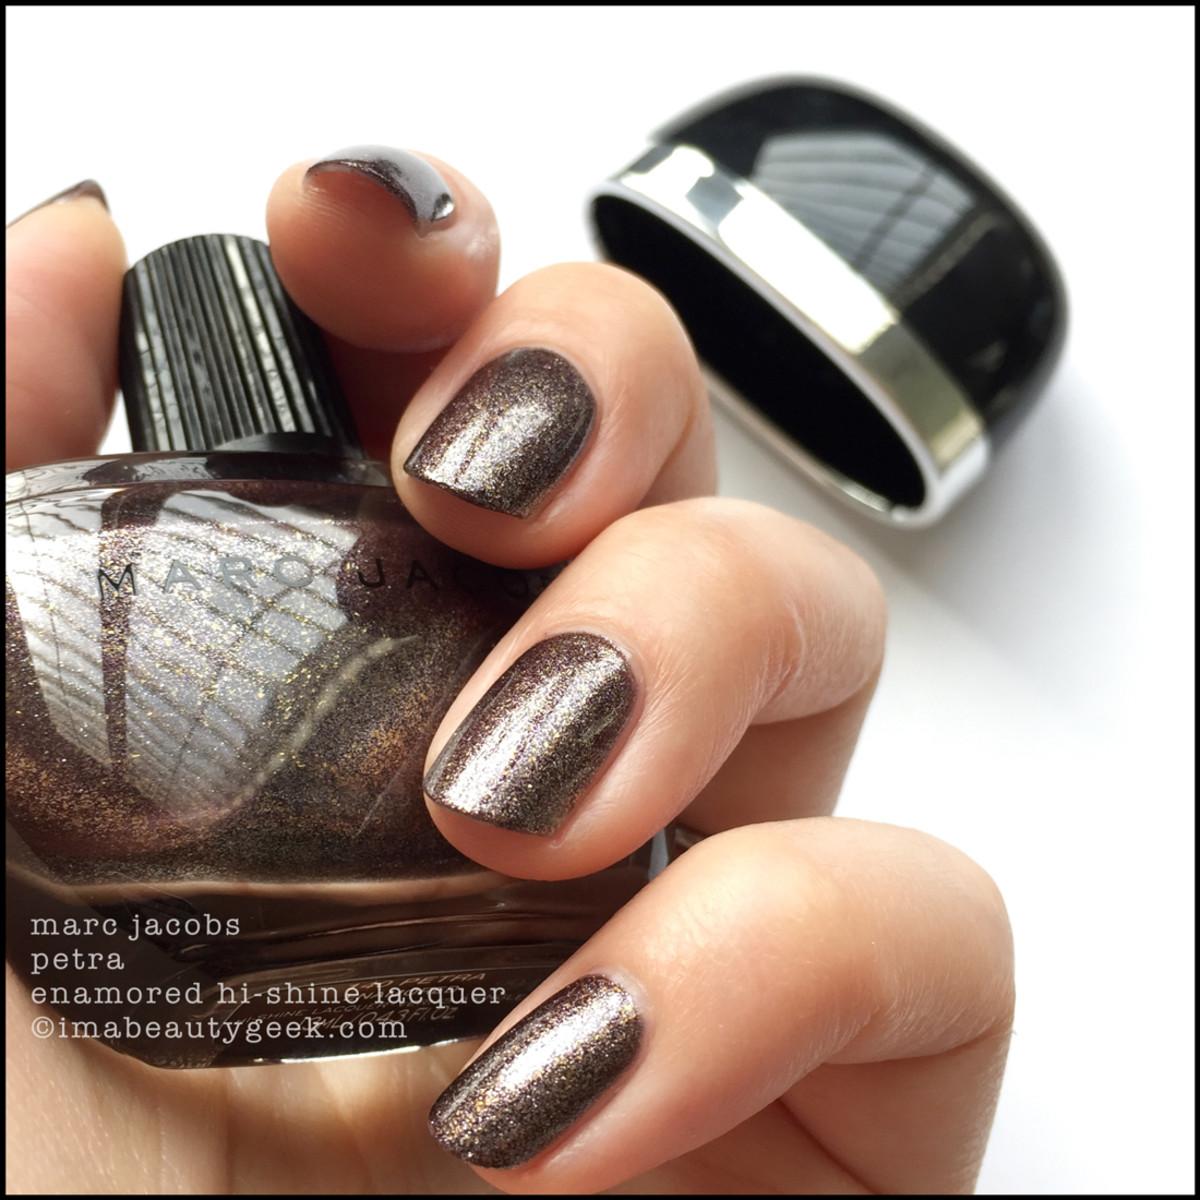 Marc Jacobs Petra Enamored Nail Polish Swatches 2